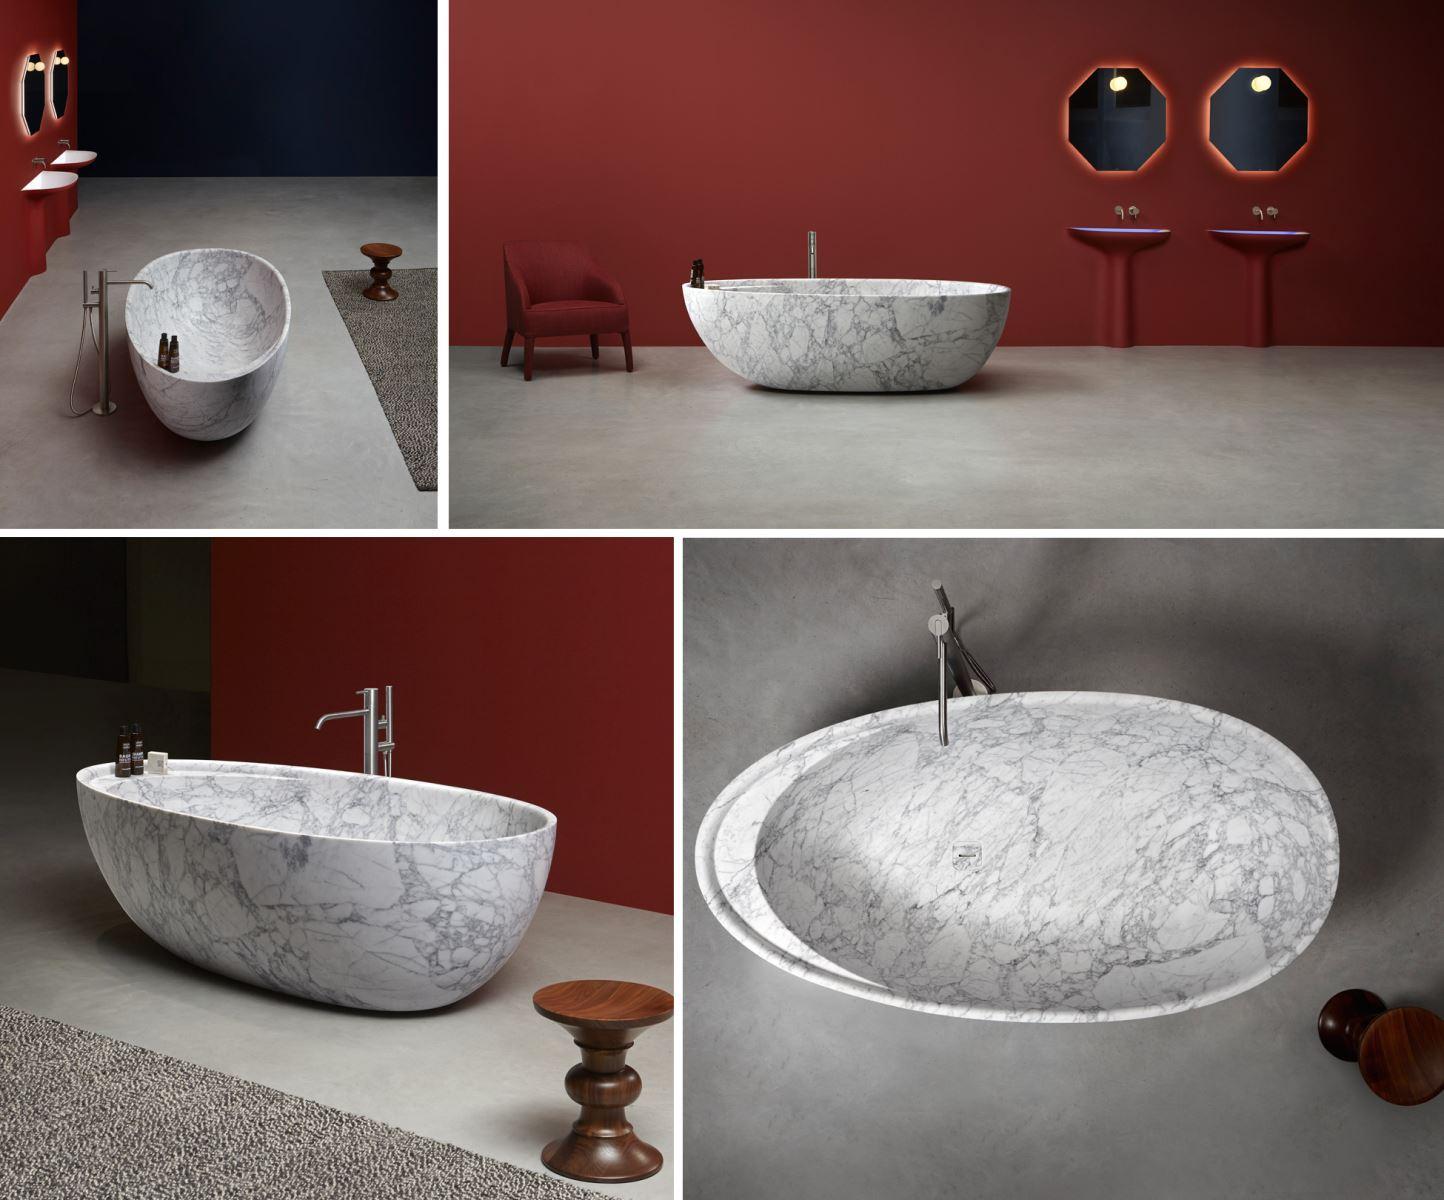 Vasca Da Bagno In Pietra Naturale Prezzi : Vasca bagno in pietra